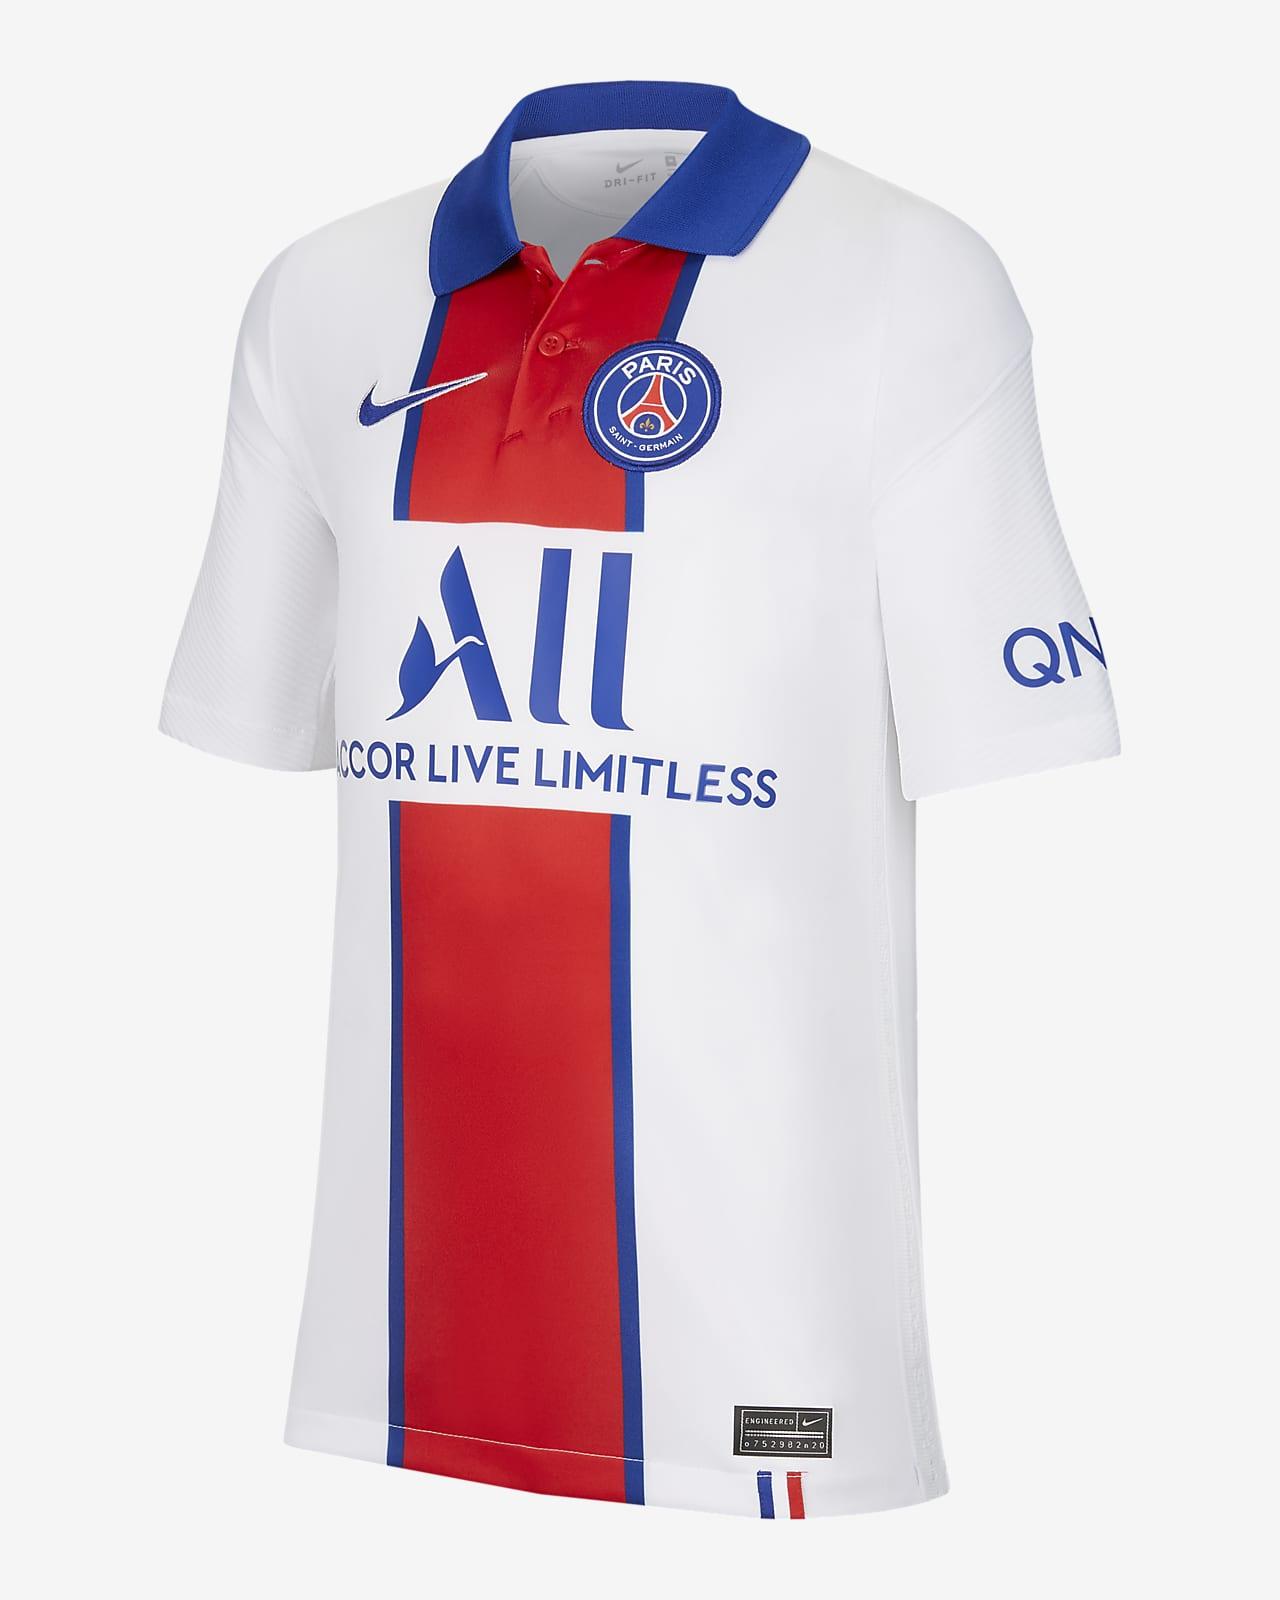 Segunda equipaci\u00f3n Stadium Par\u00eds Saint-Germain 2020\/21 Camiseta de f\u00fatbol - Ni\u00f1o\/a. Nike ES